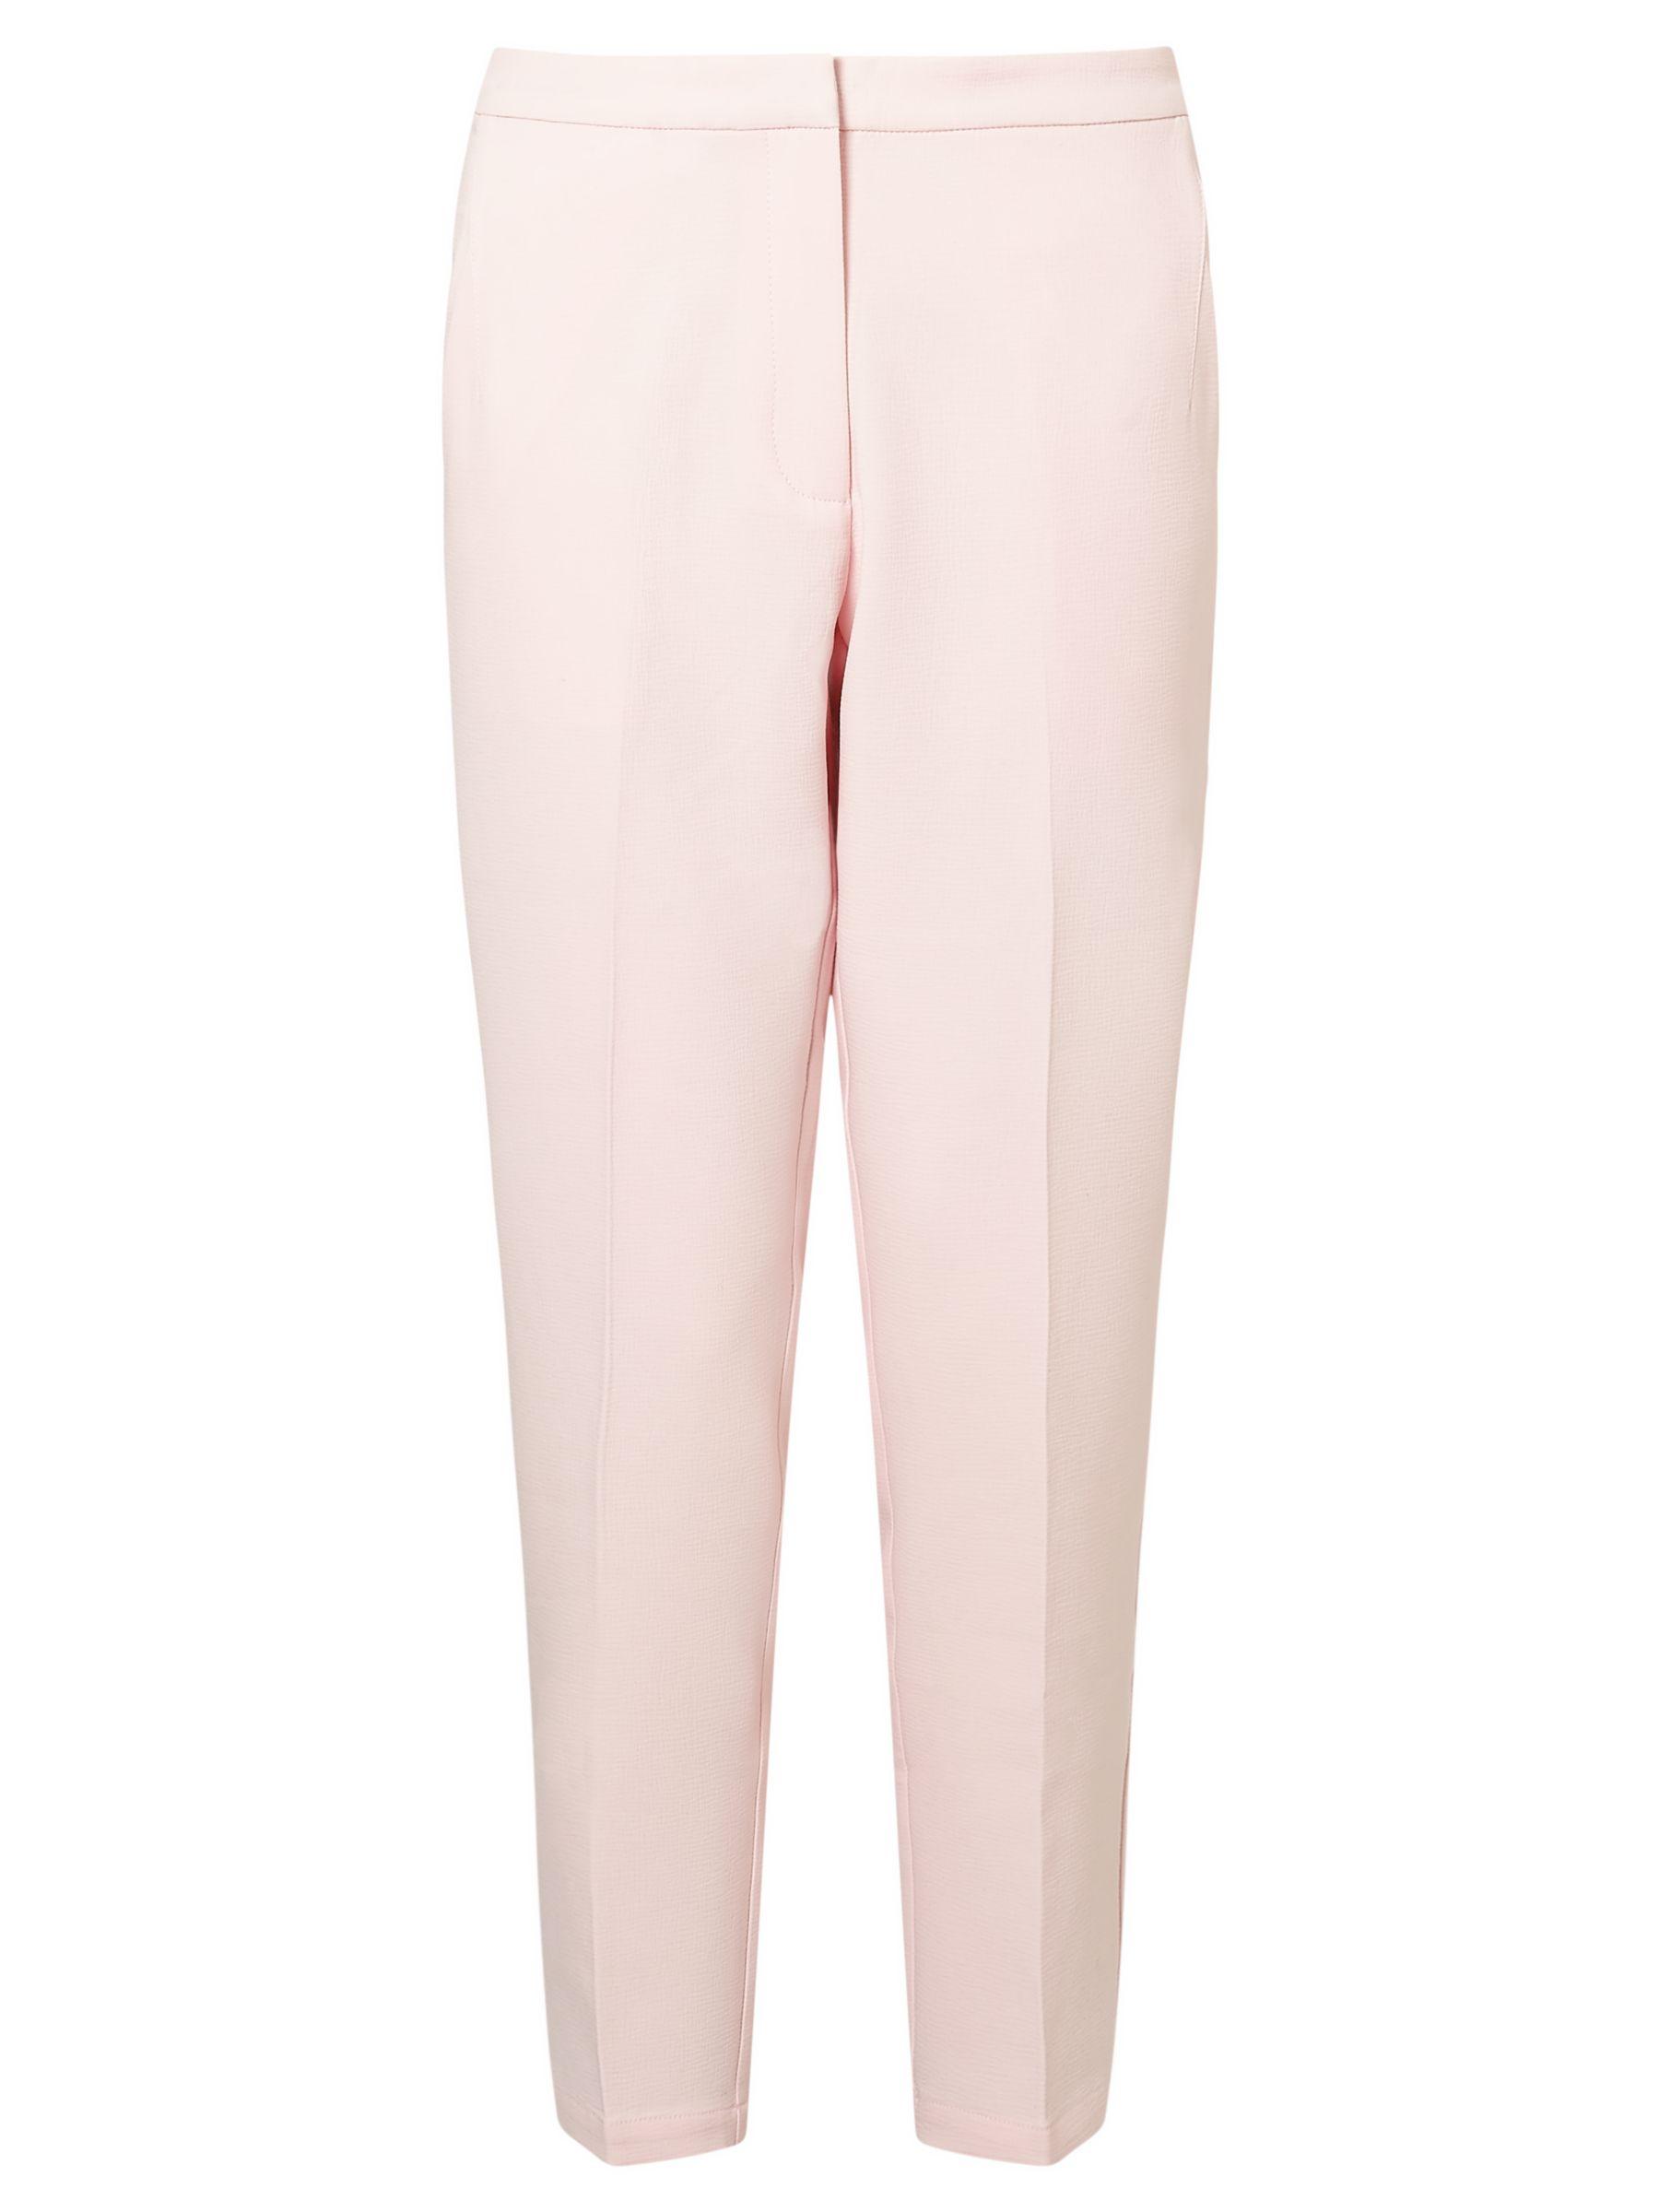 Minimum Minimum Halle Trousers, Pink